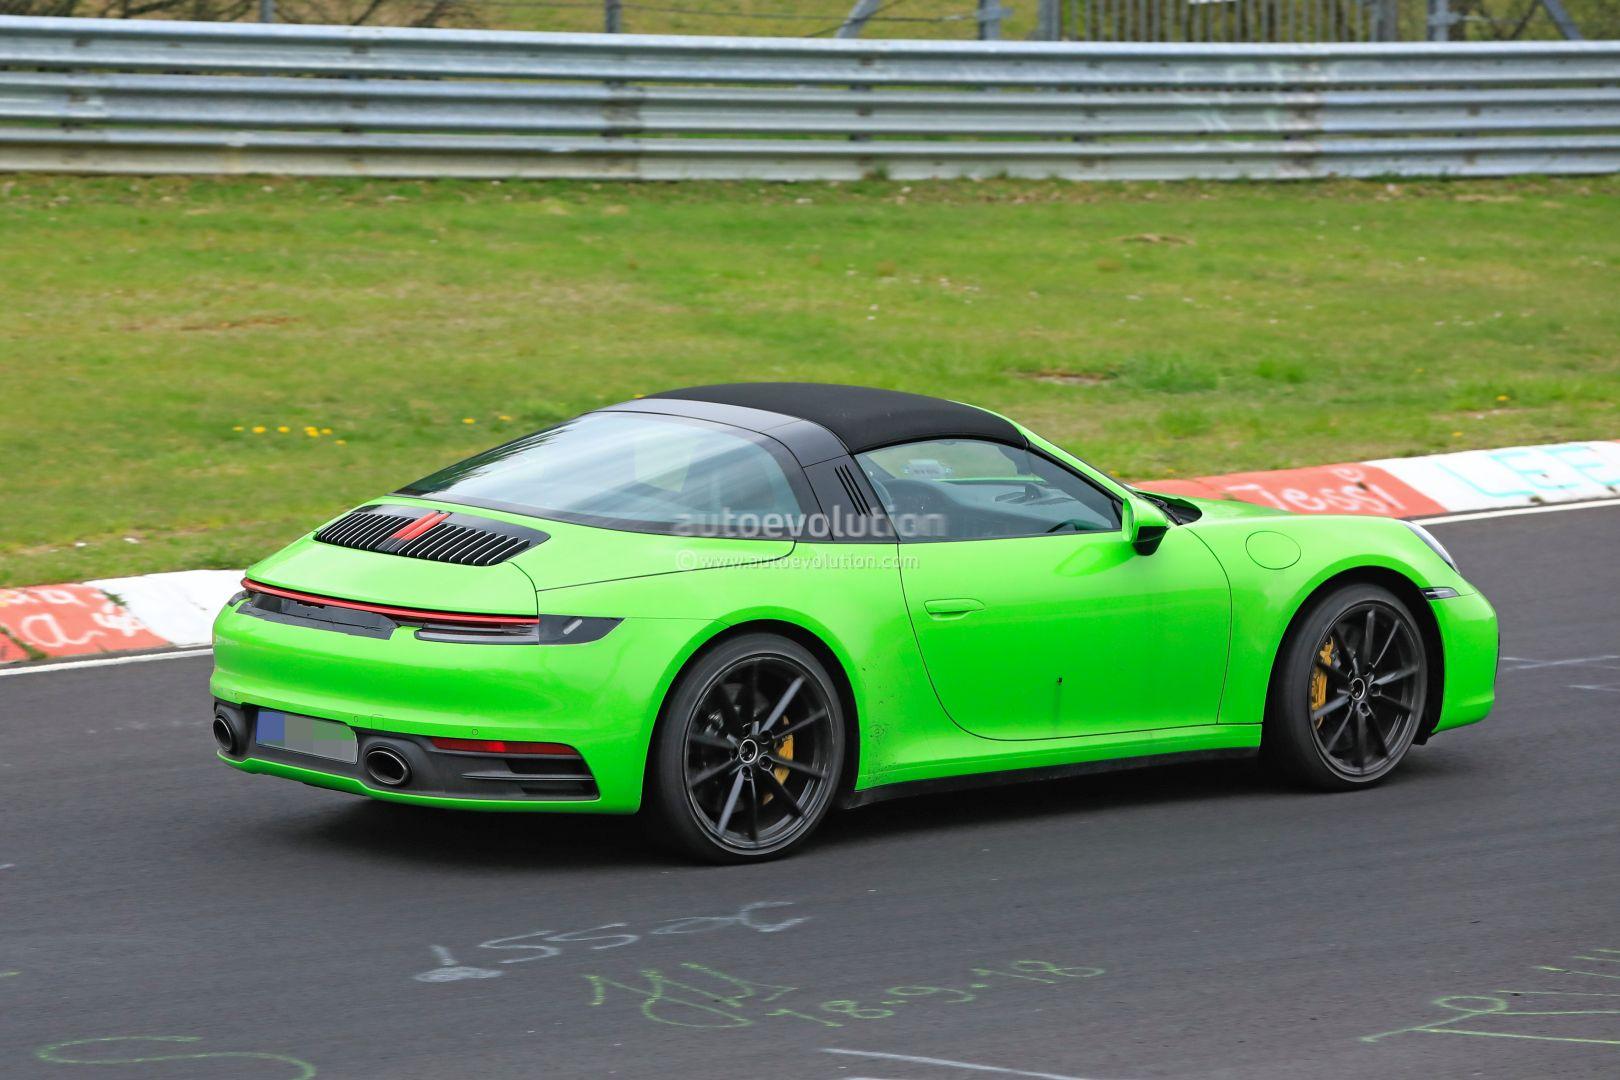 New Porsche 911 Targa 992 Spotted On Nurburgring Turbo